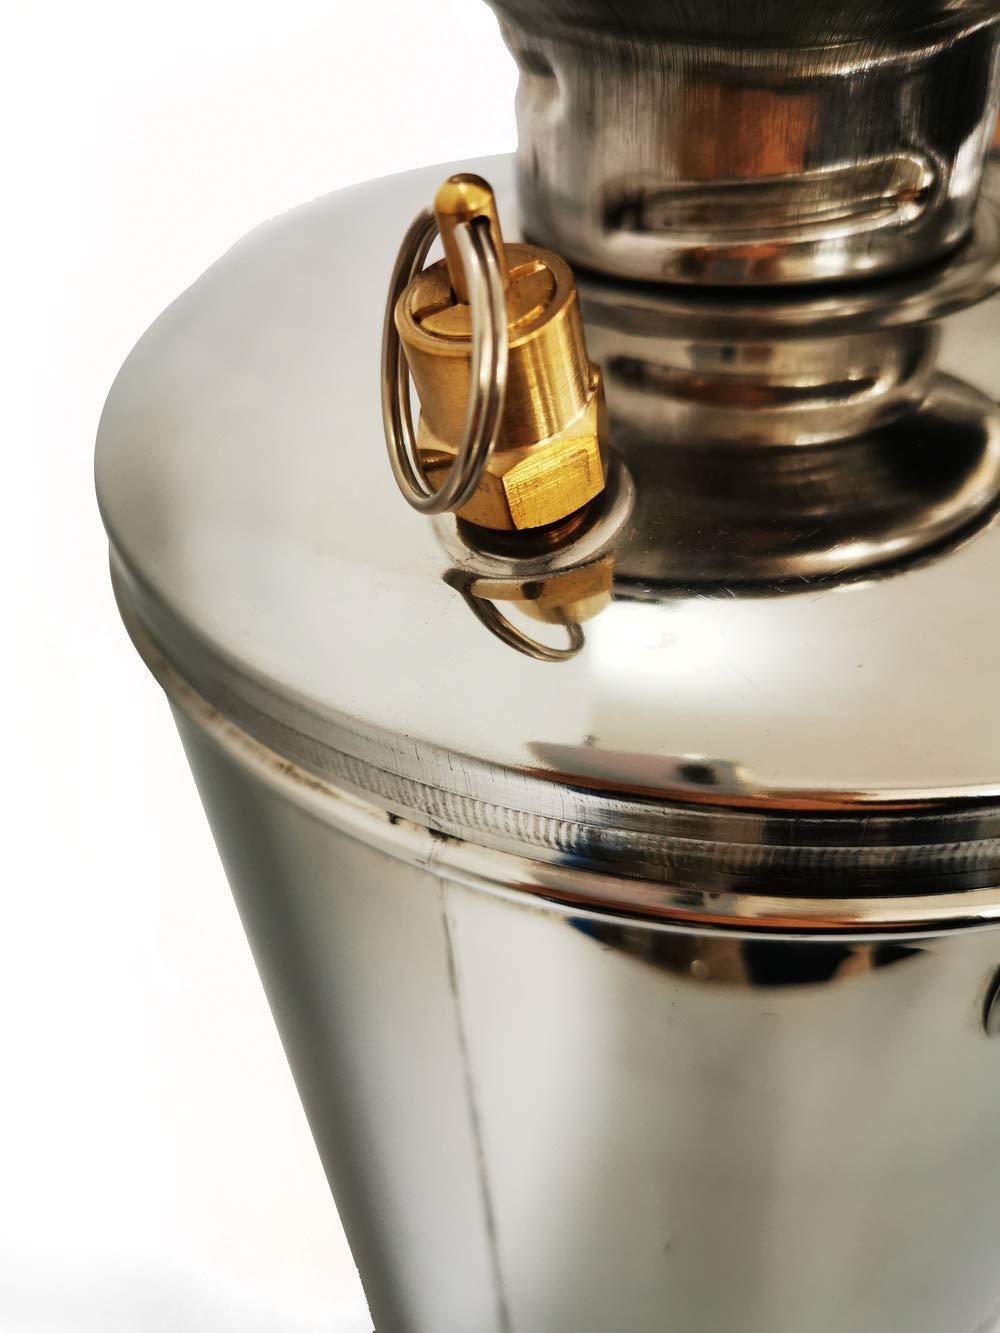 Longray Stainless Steel Hand-Pumped Sprayer (1.5-Gallon)